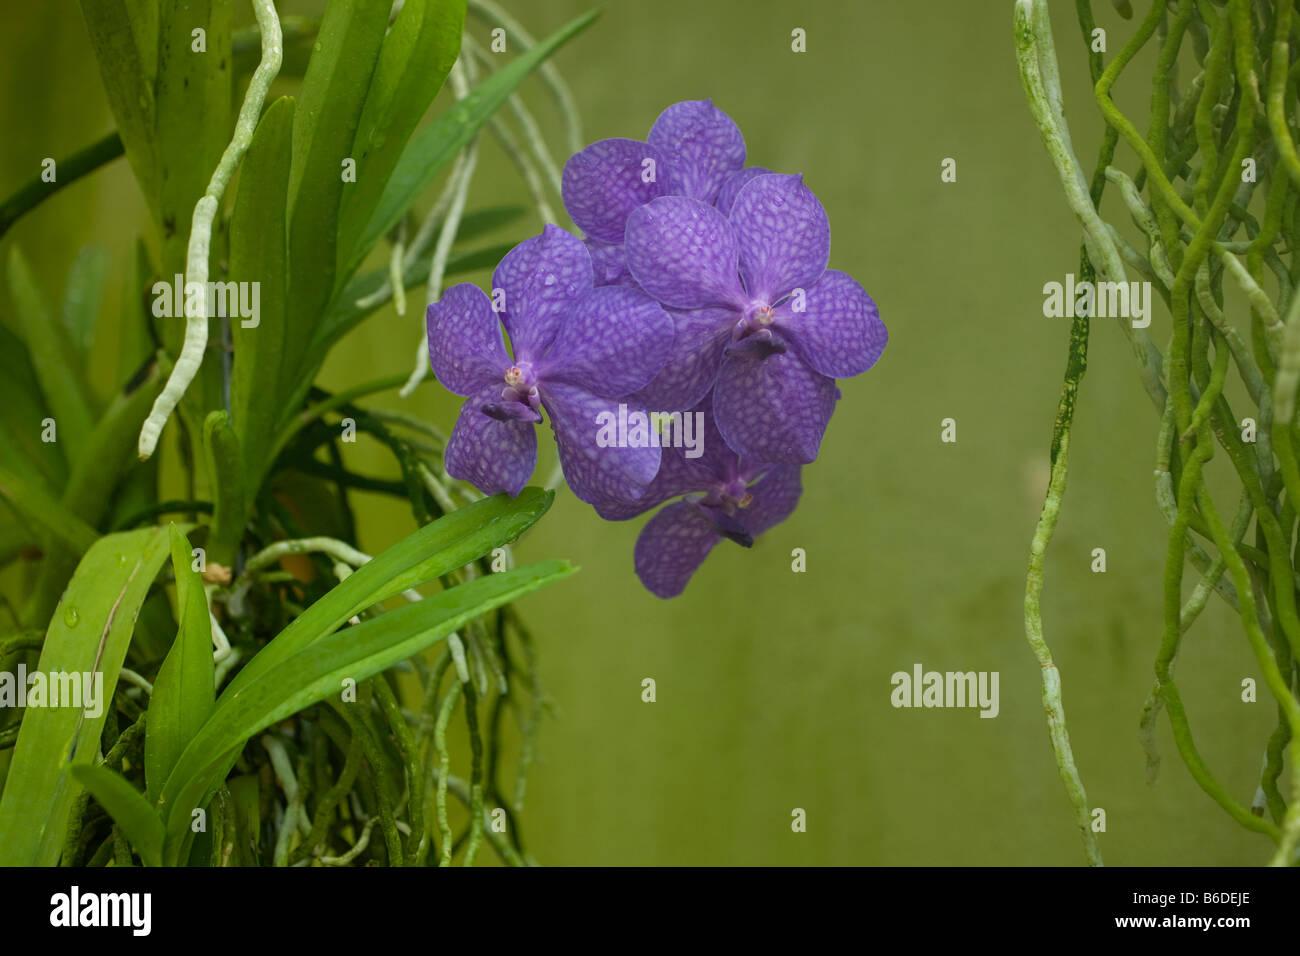 Vanda Manivadee Sky orchid family - Stock Image